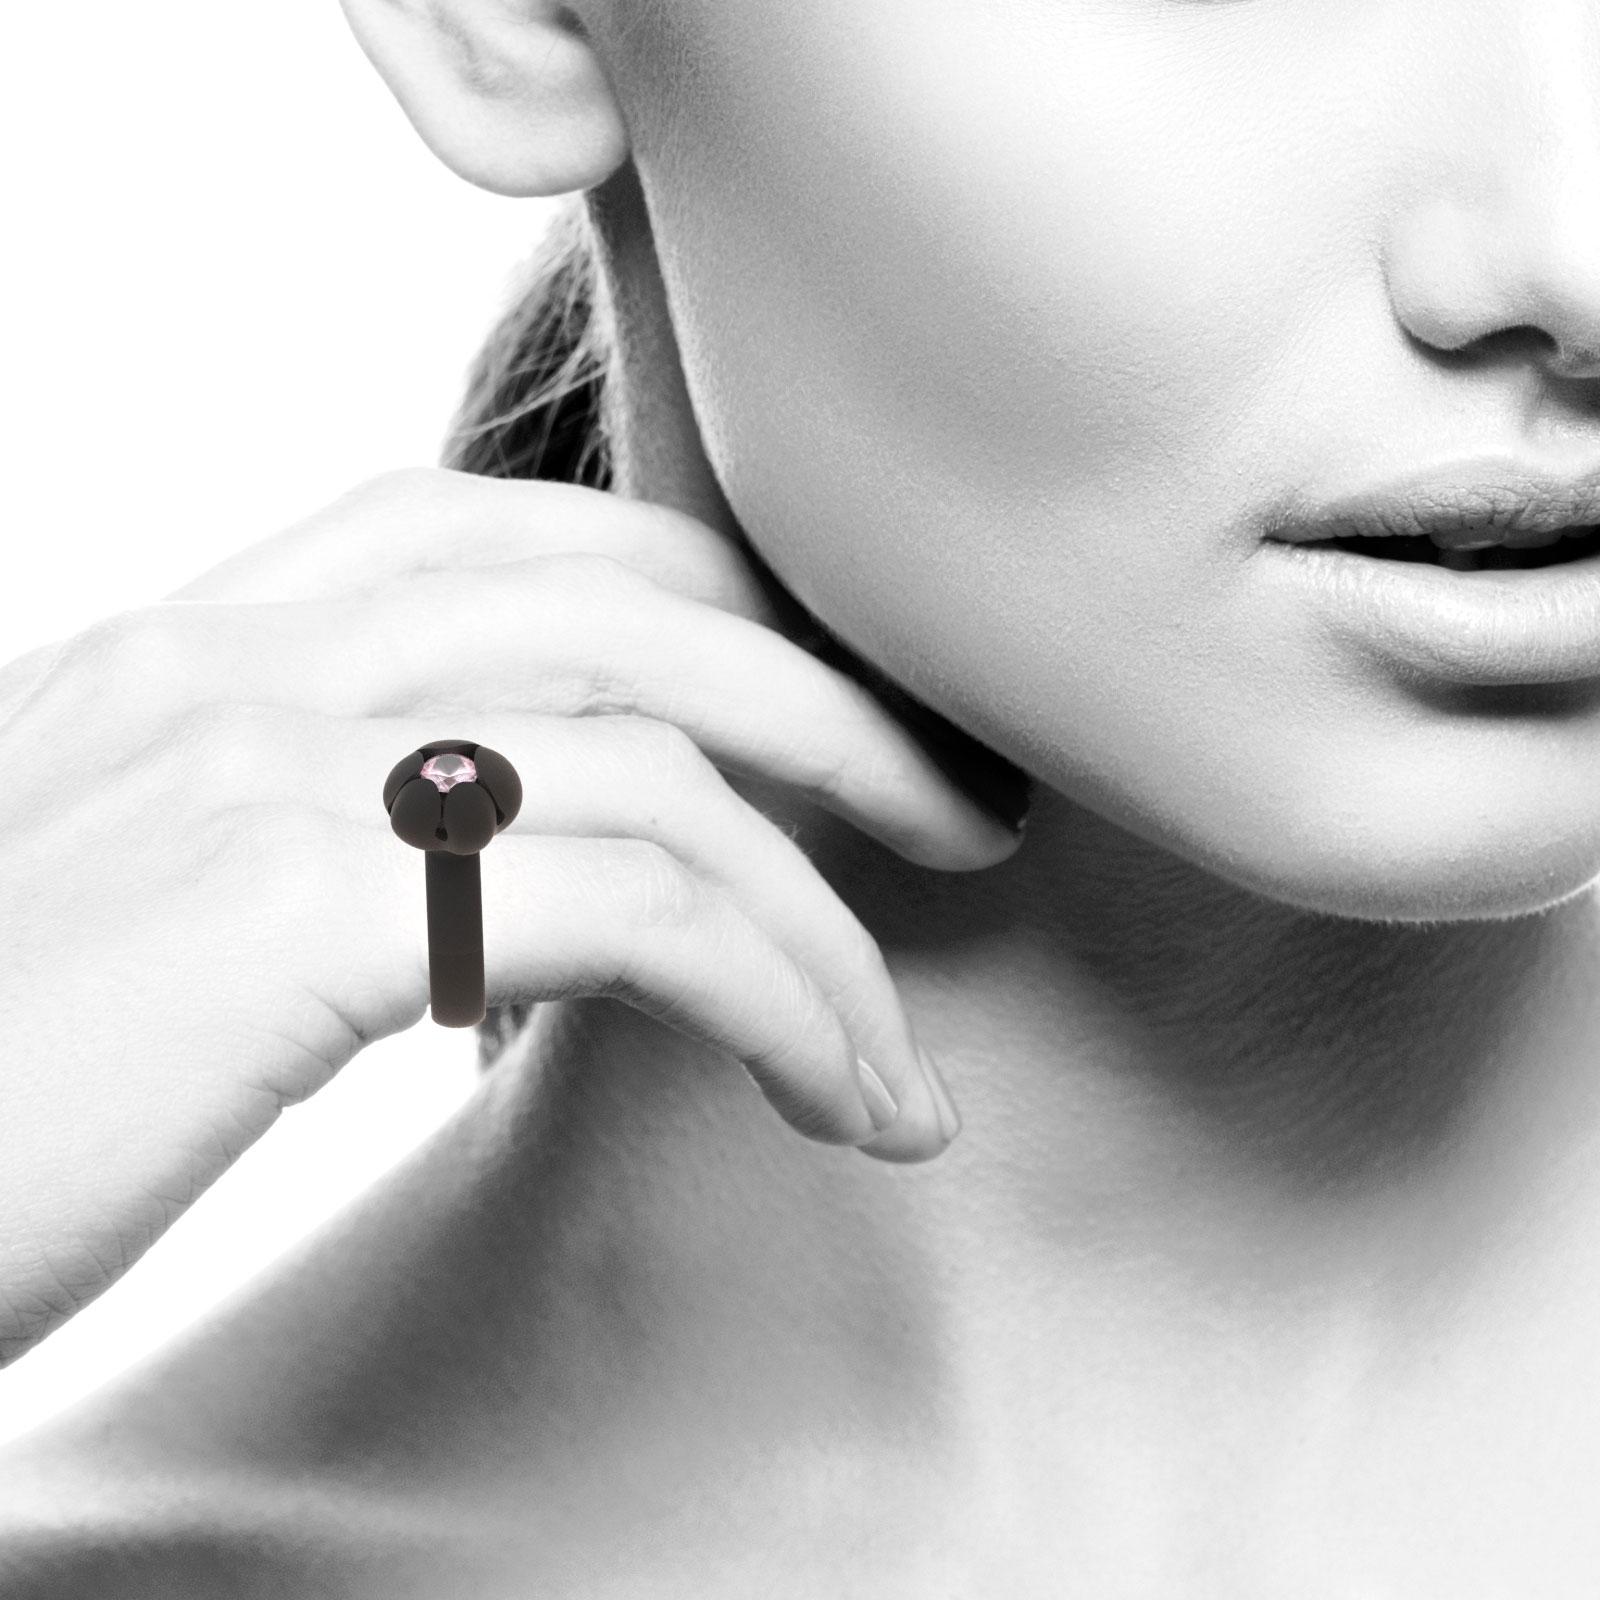 Bud Ring, 6mm Rose Quartz